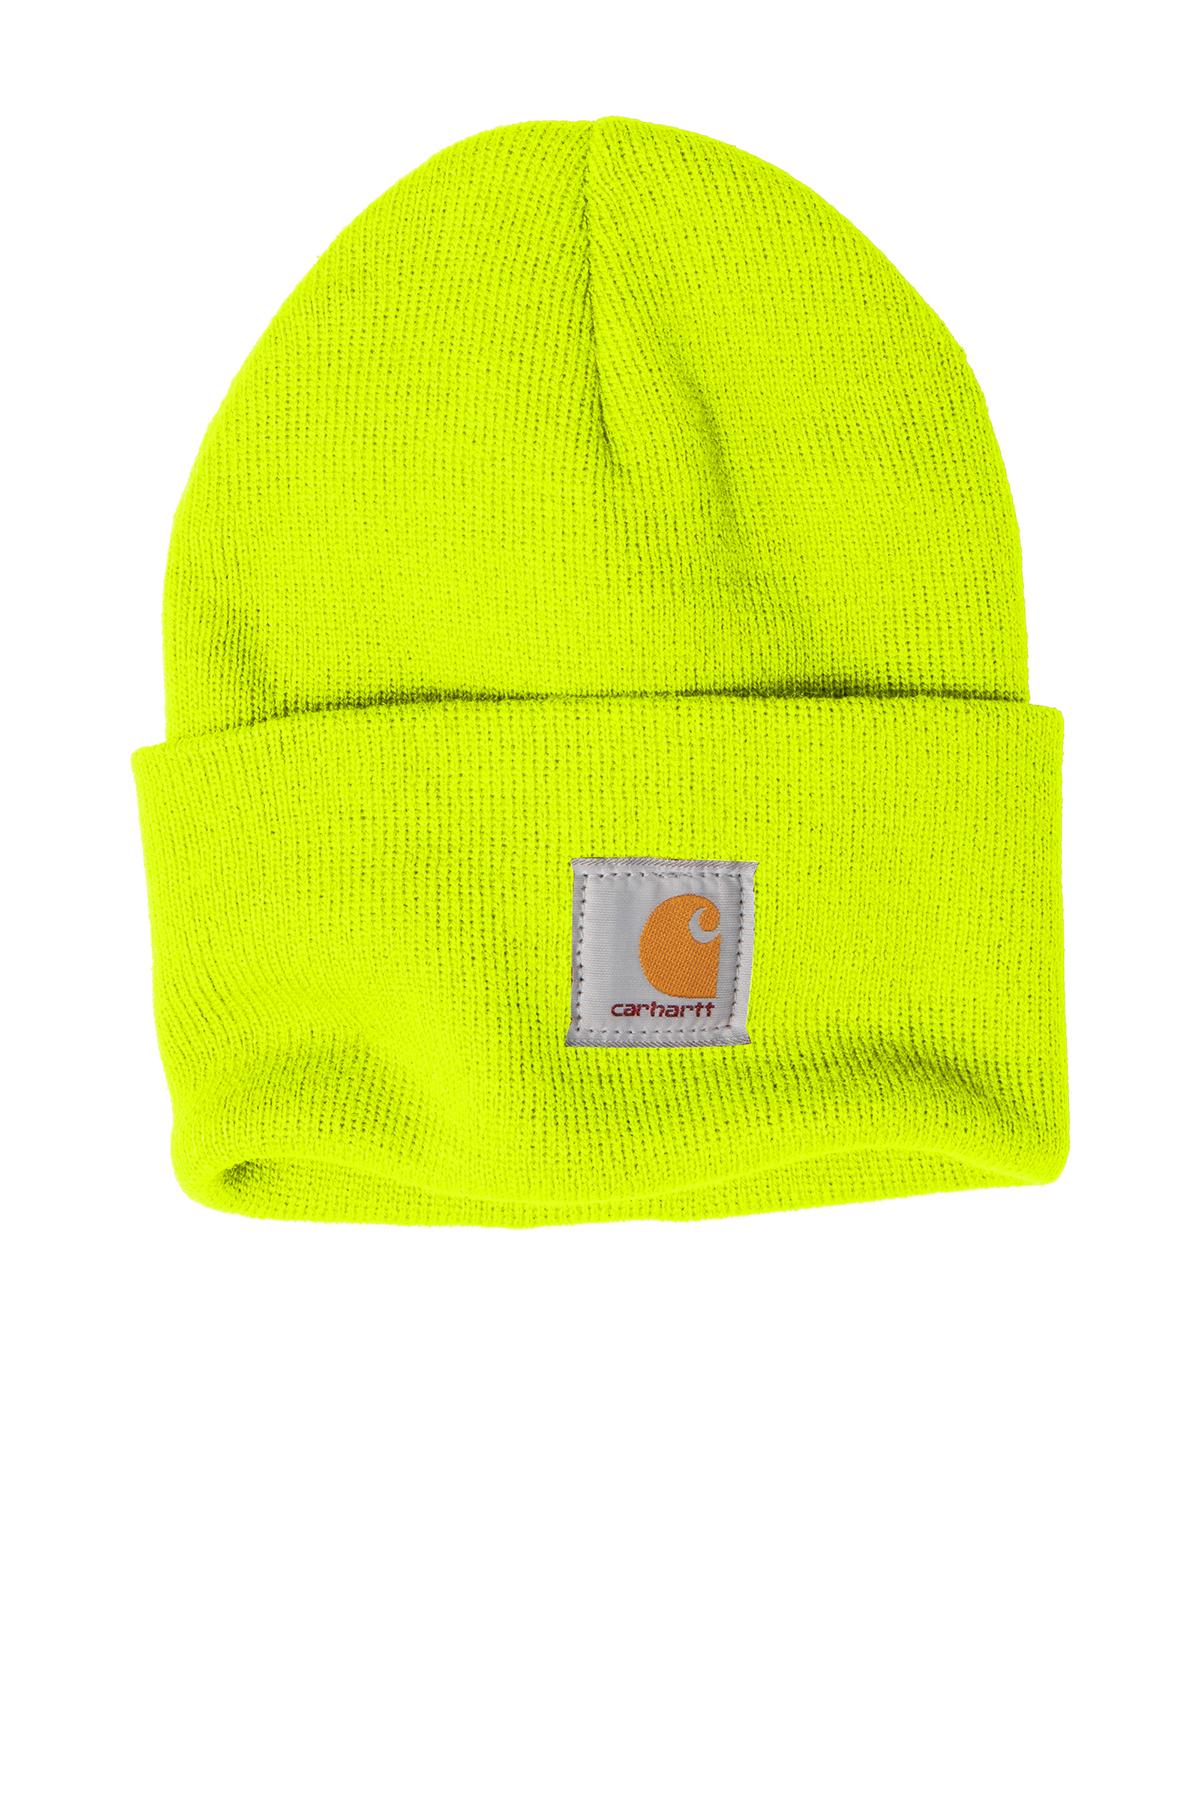 Carhartt® CTA18 - Acrylic Watch Hat  12.99 - Headwear 0008e85b1705